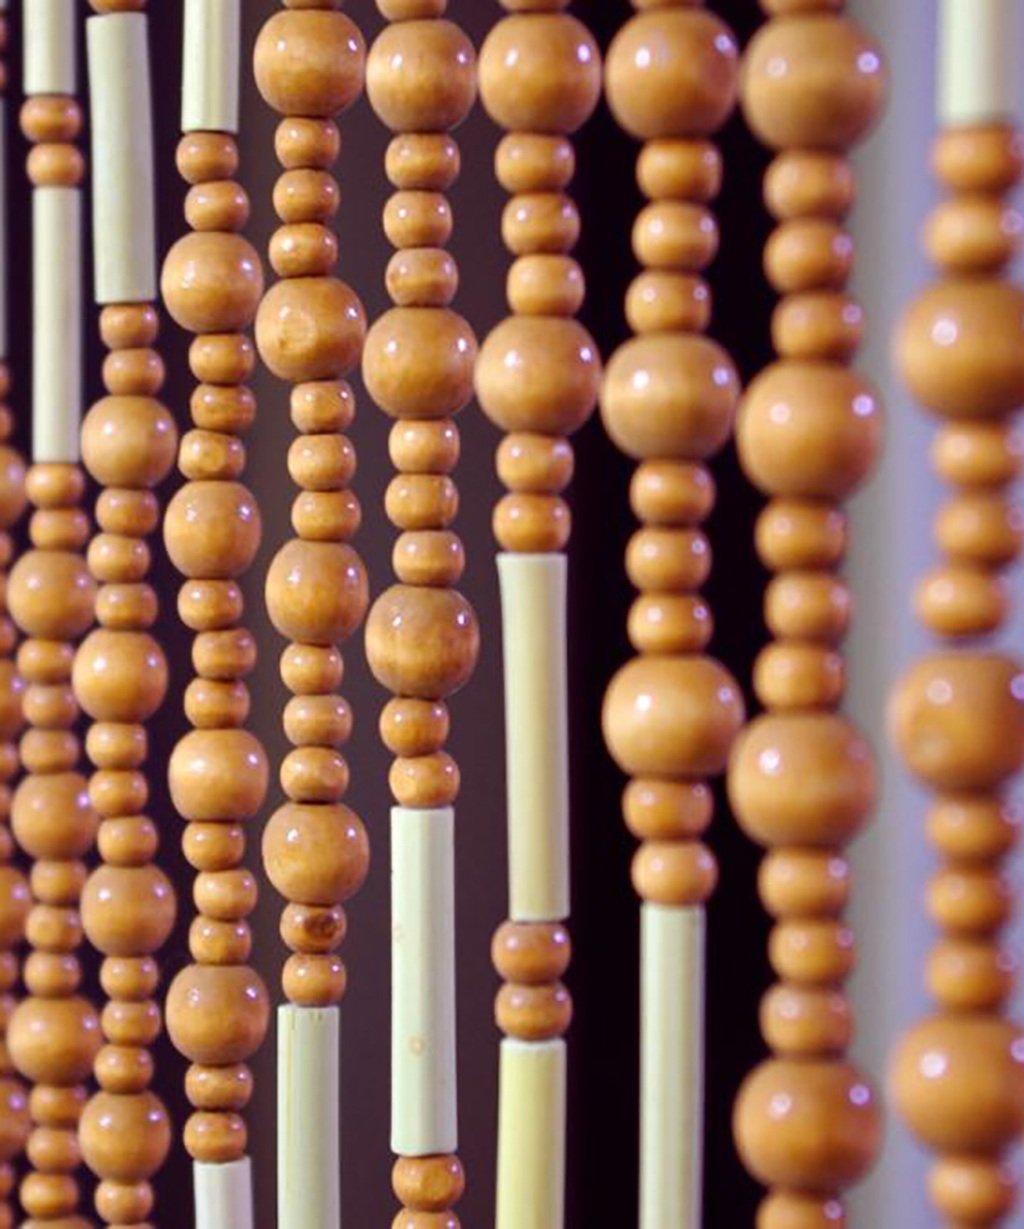 WUFENG Sommer Zimmer Tür Fenster Bambus Hölzern Perlenvorhang Türvorhang Fadenvorhang Fadenstore Raumteiler Anti-Moskitos Vorhänge (größe   90  180cm)